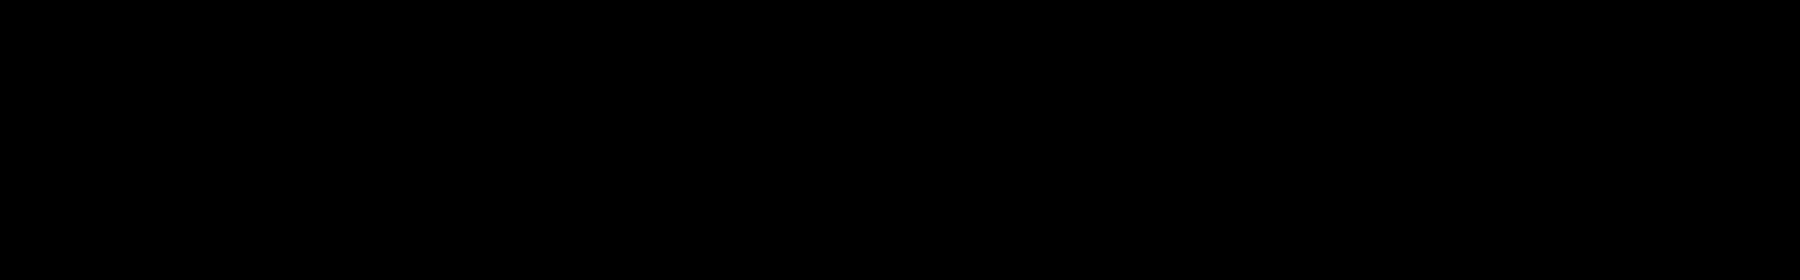 Arson audio waveform